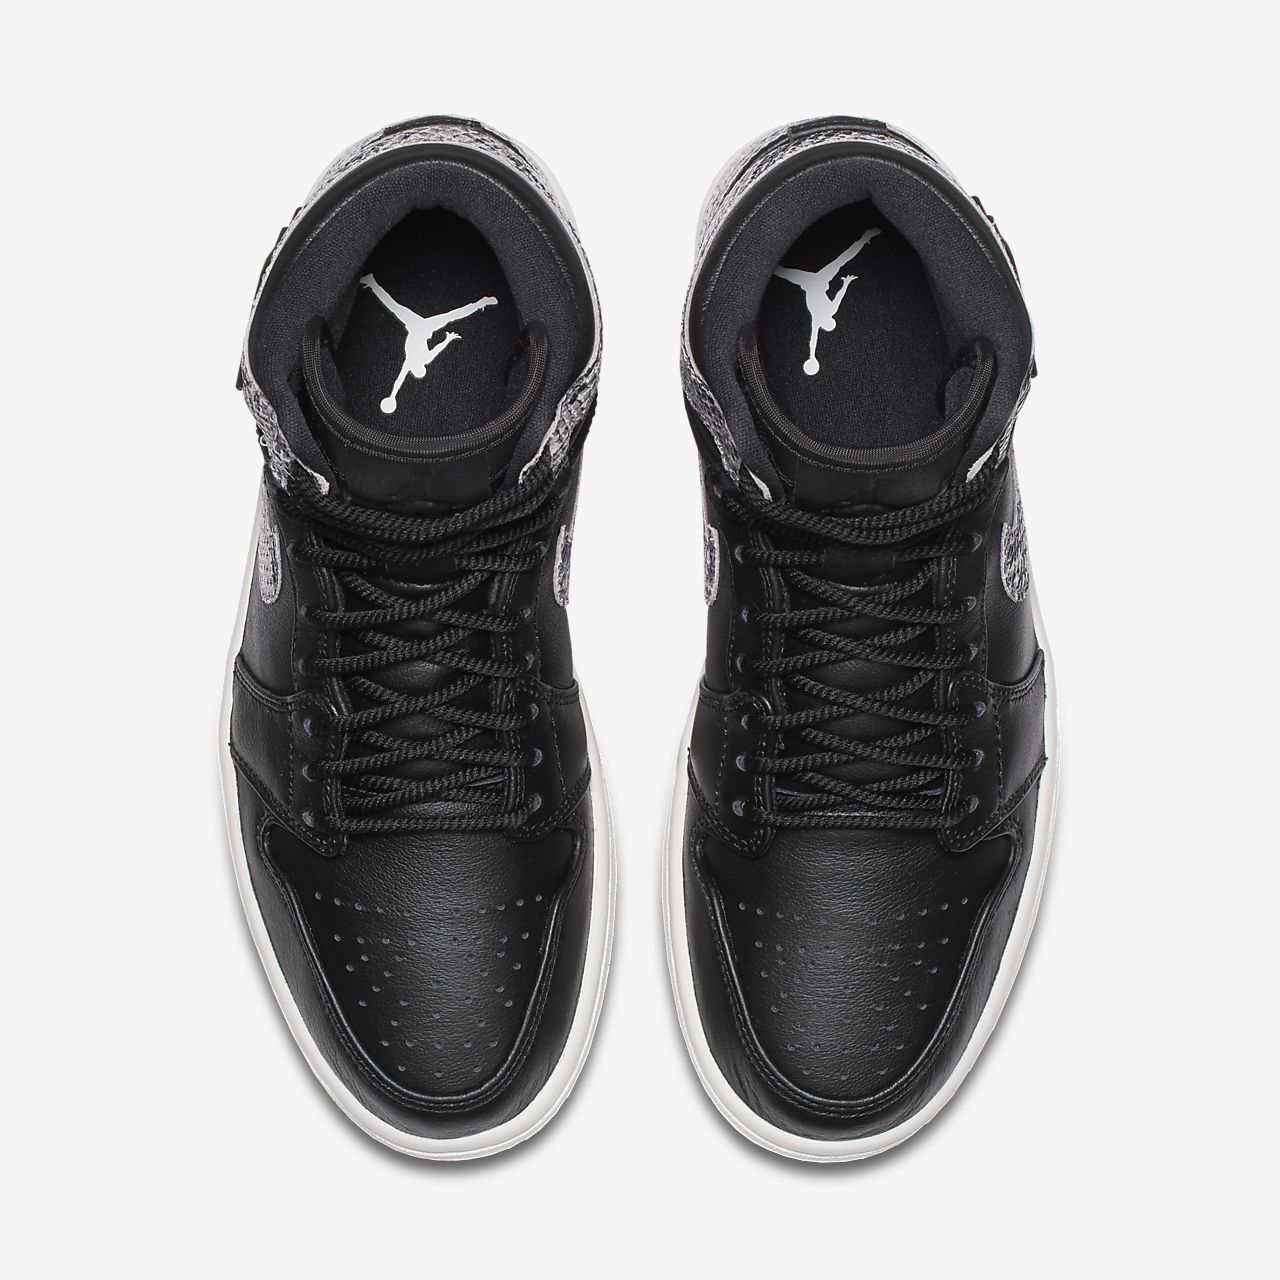 Air Jordan Jordan Jordan 1 Retro High Premium Damenschuh      Neues Produkt  e206c6